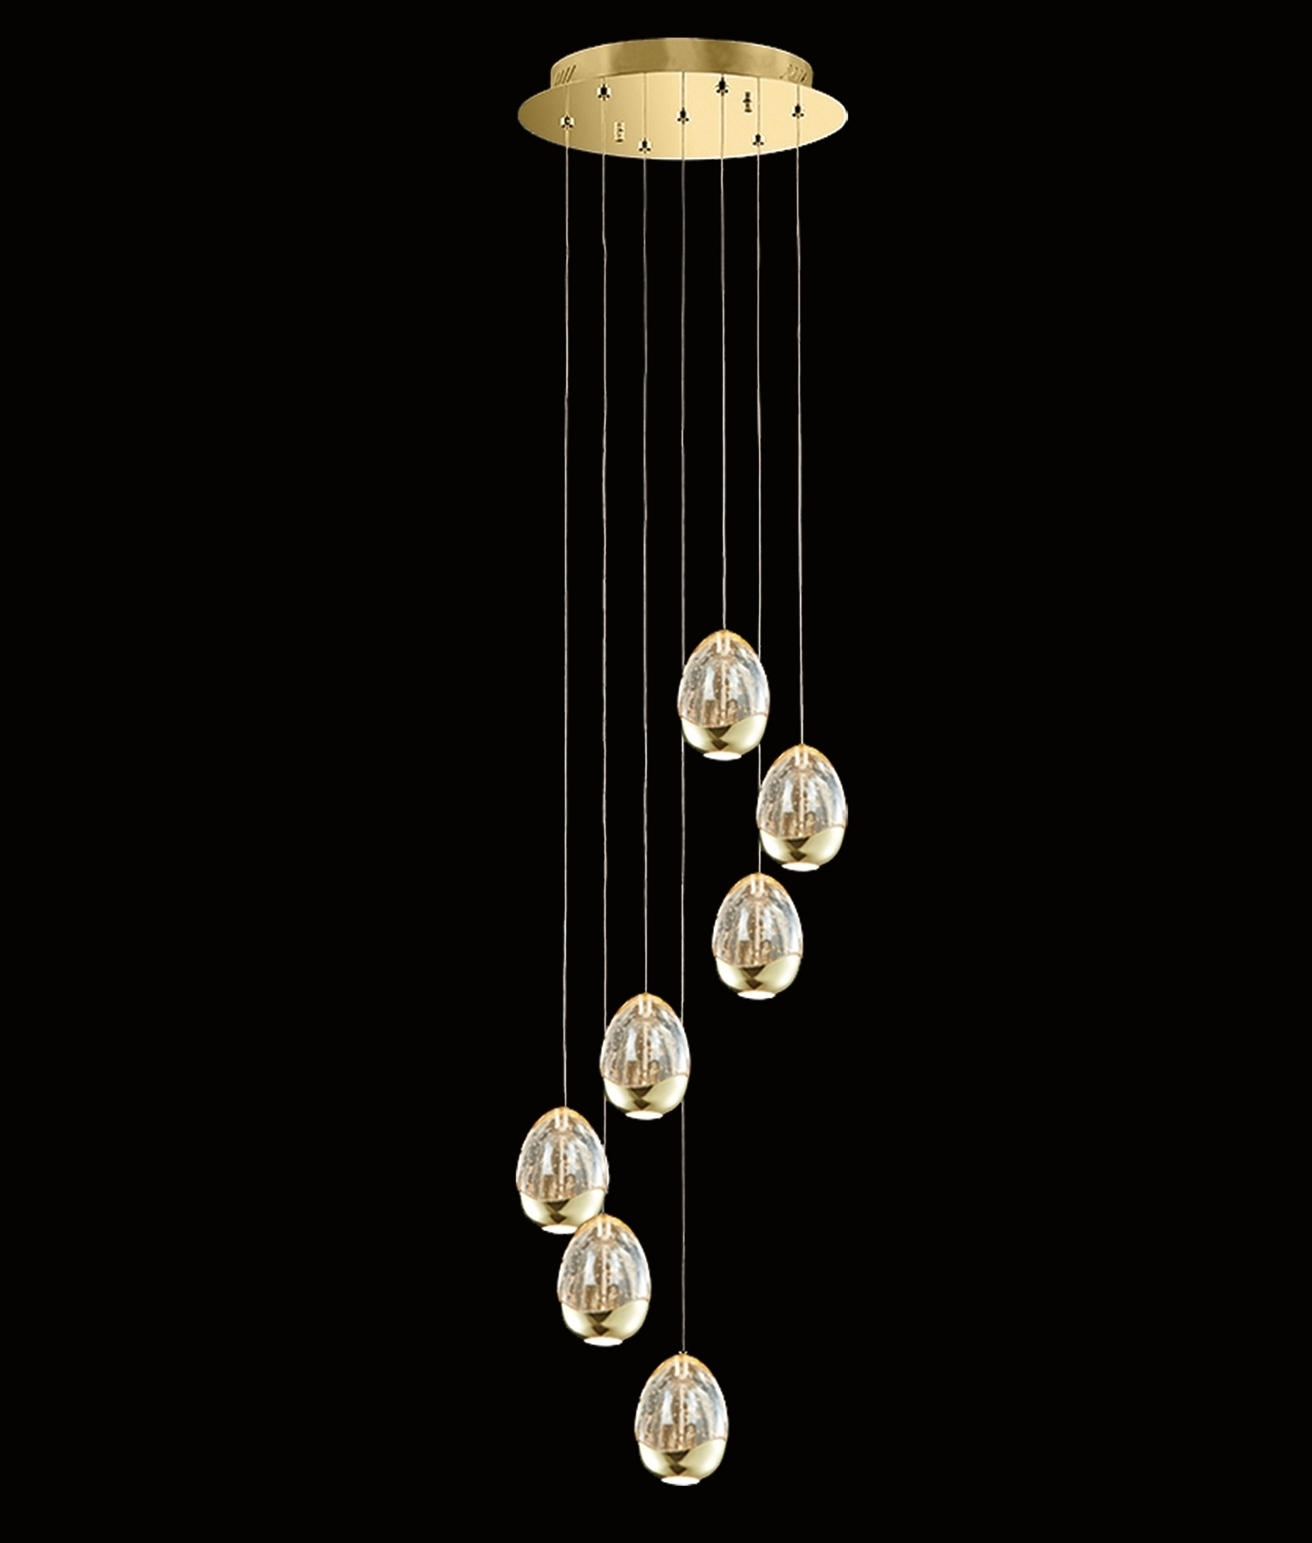 Led Light Pendants